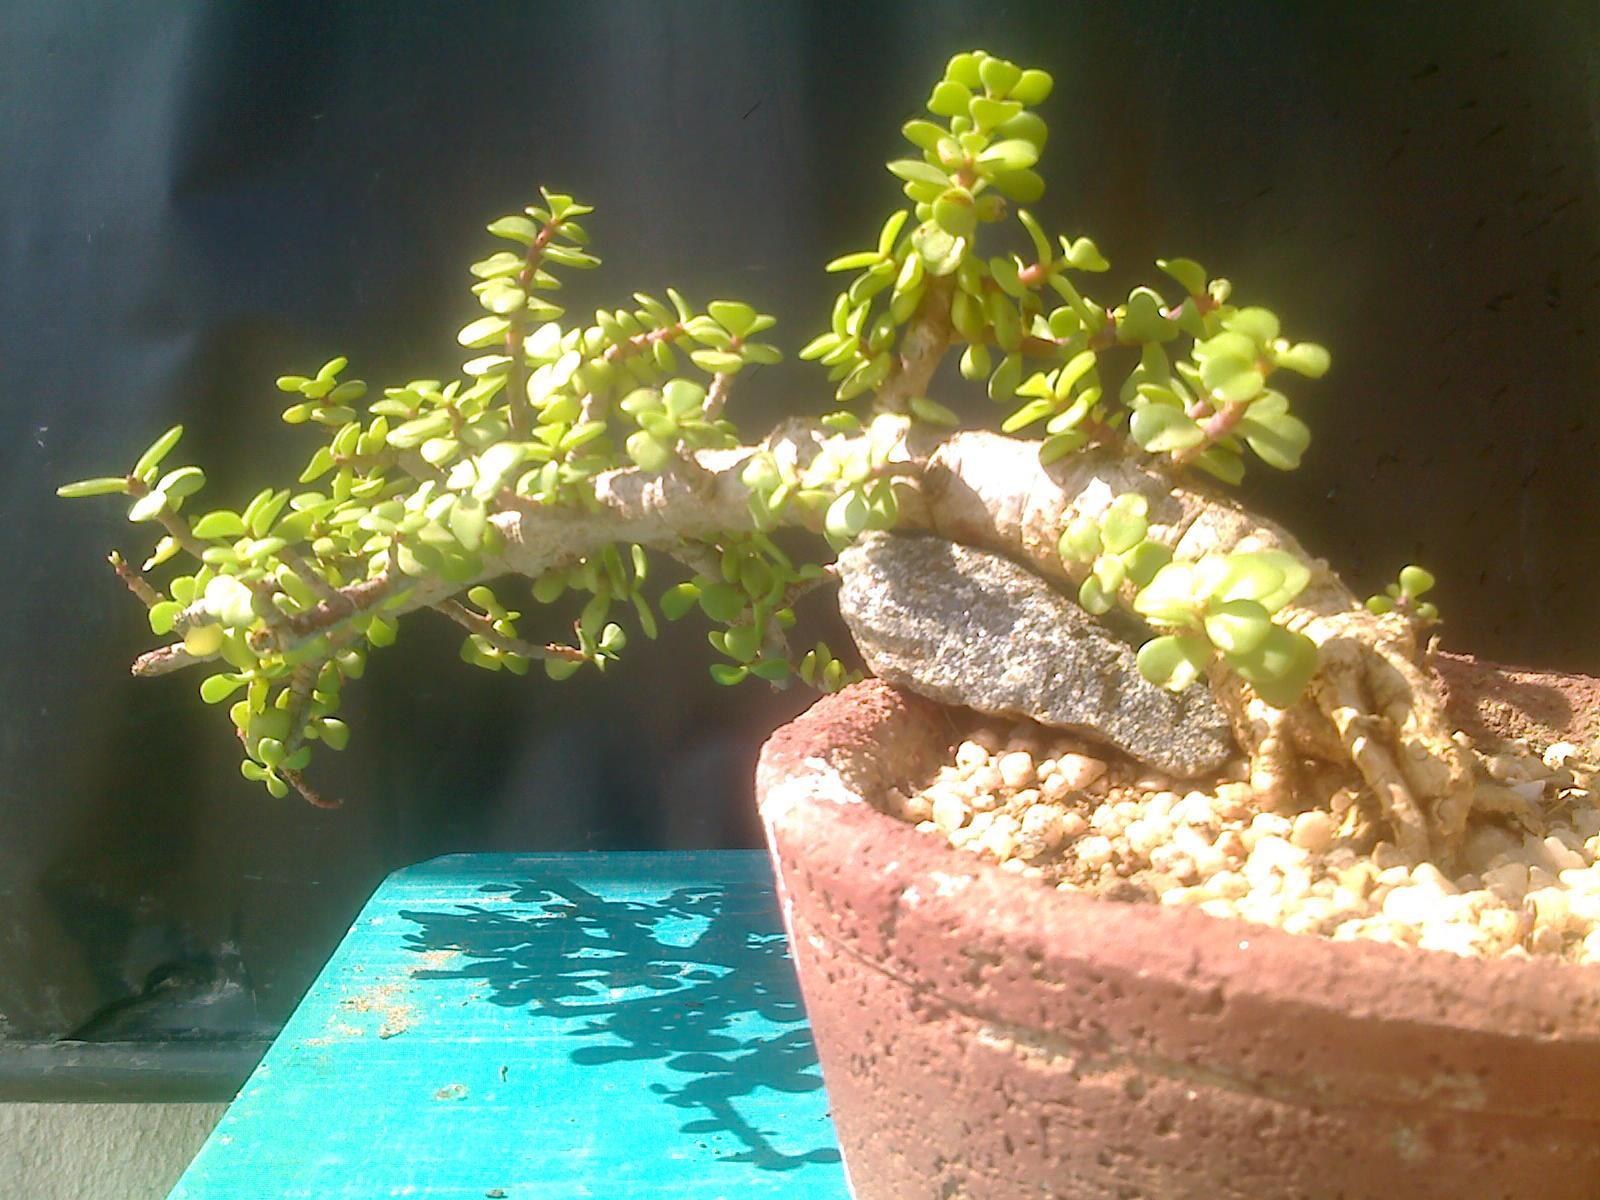 Indian Bonsai The Mame Jade And Pomgranate Bonsai39s